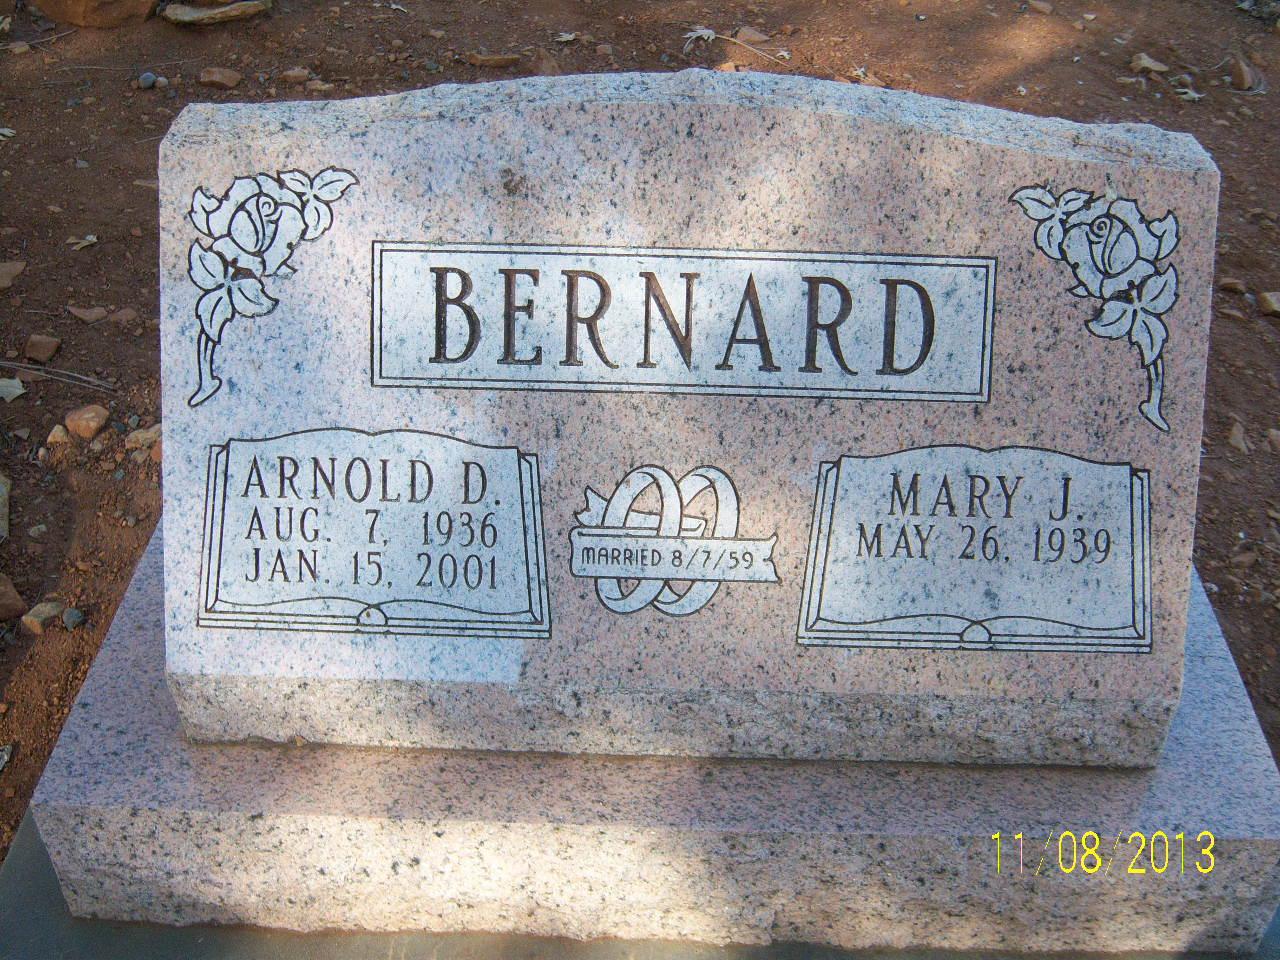 Arnold Daniel Bernard